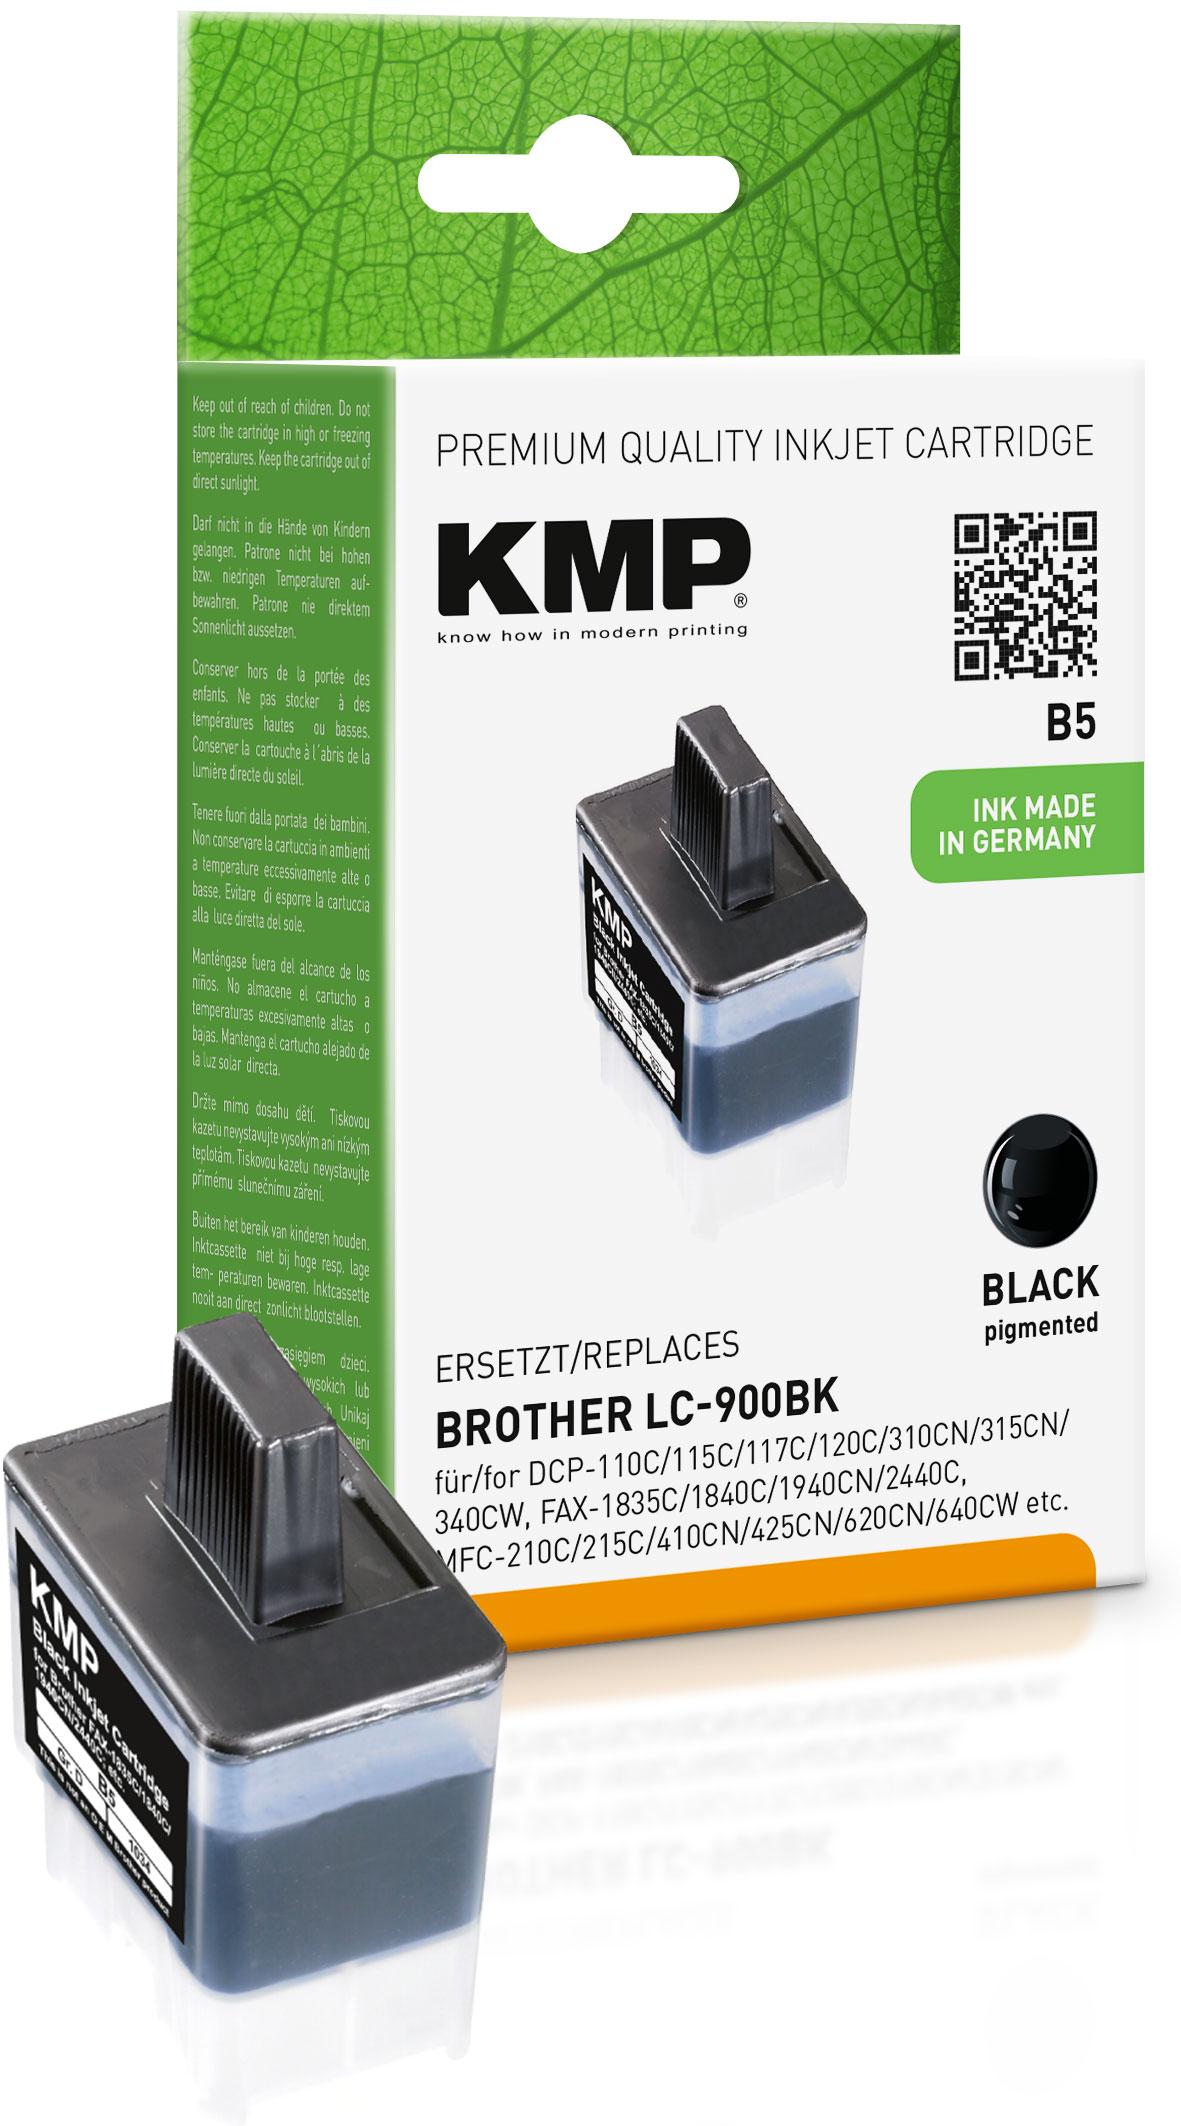 KMP Tintenpatrone schwarz (1034,0001, B5)